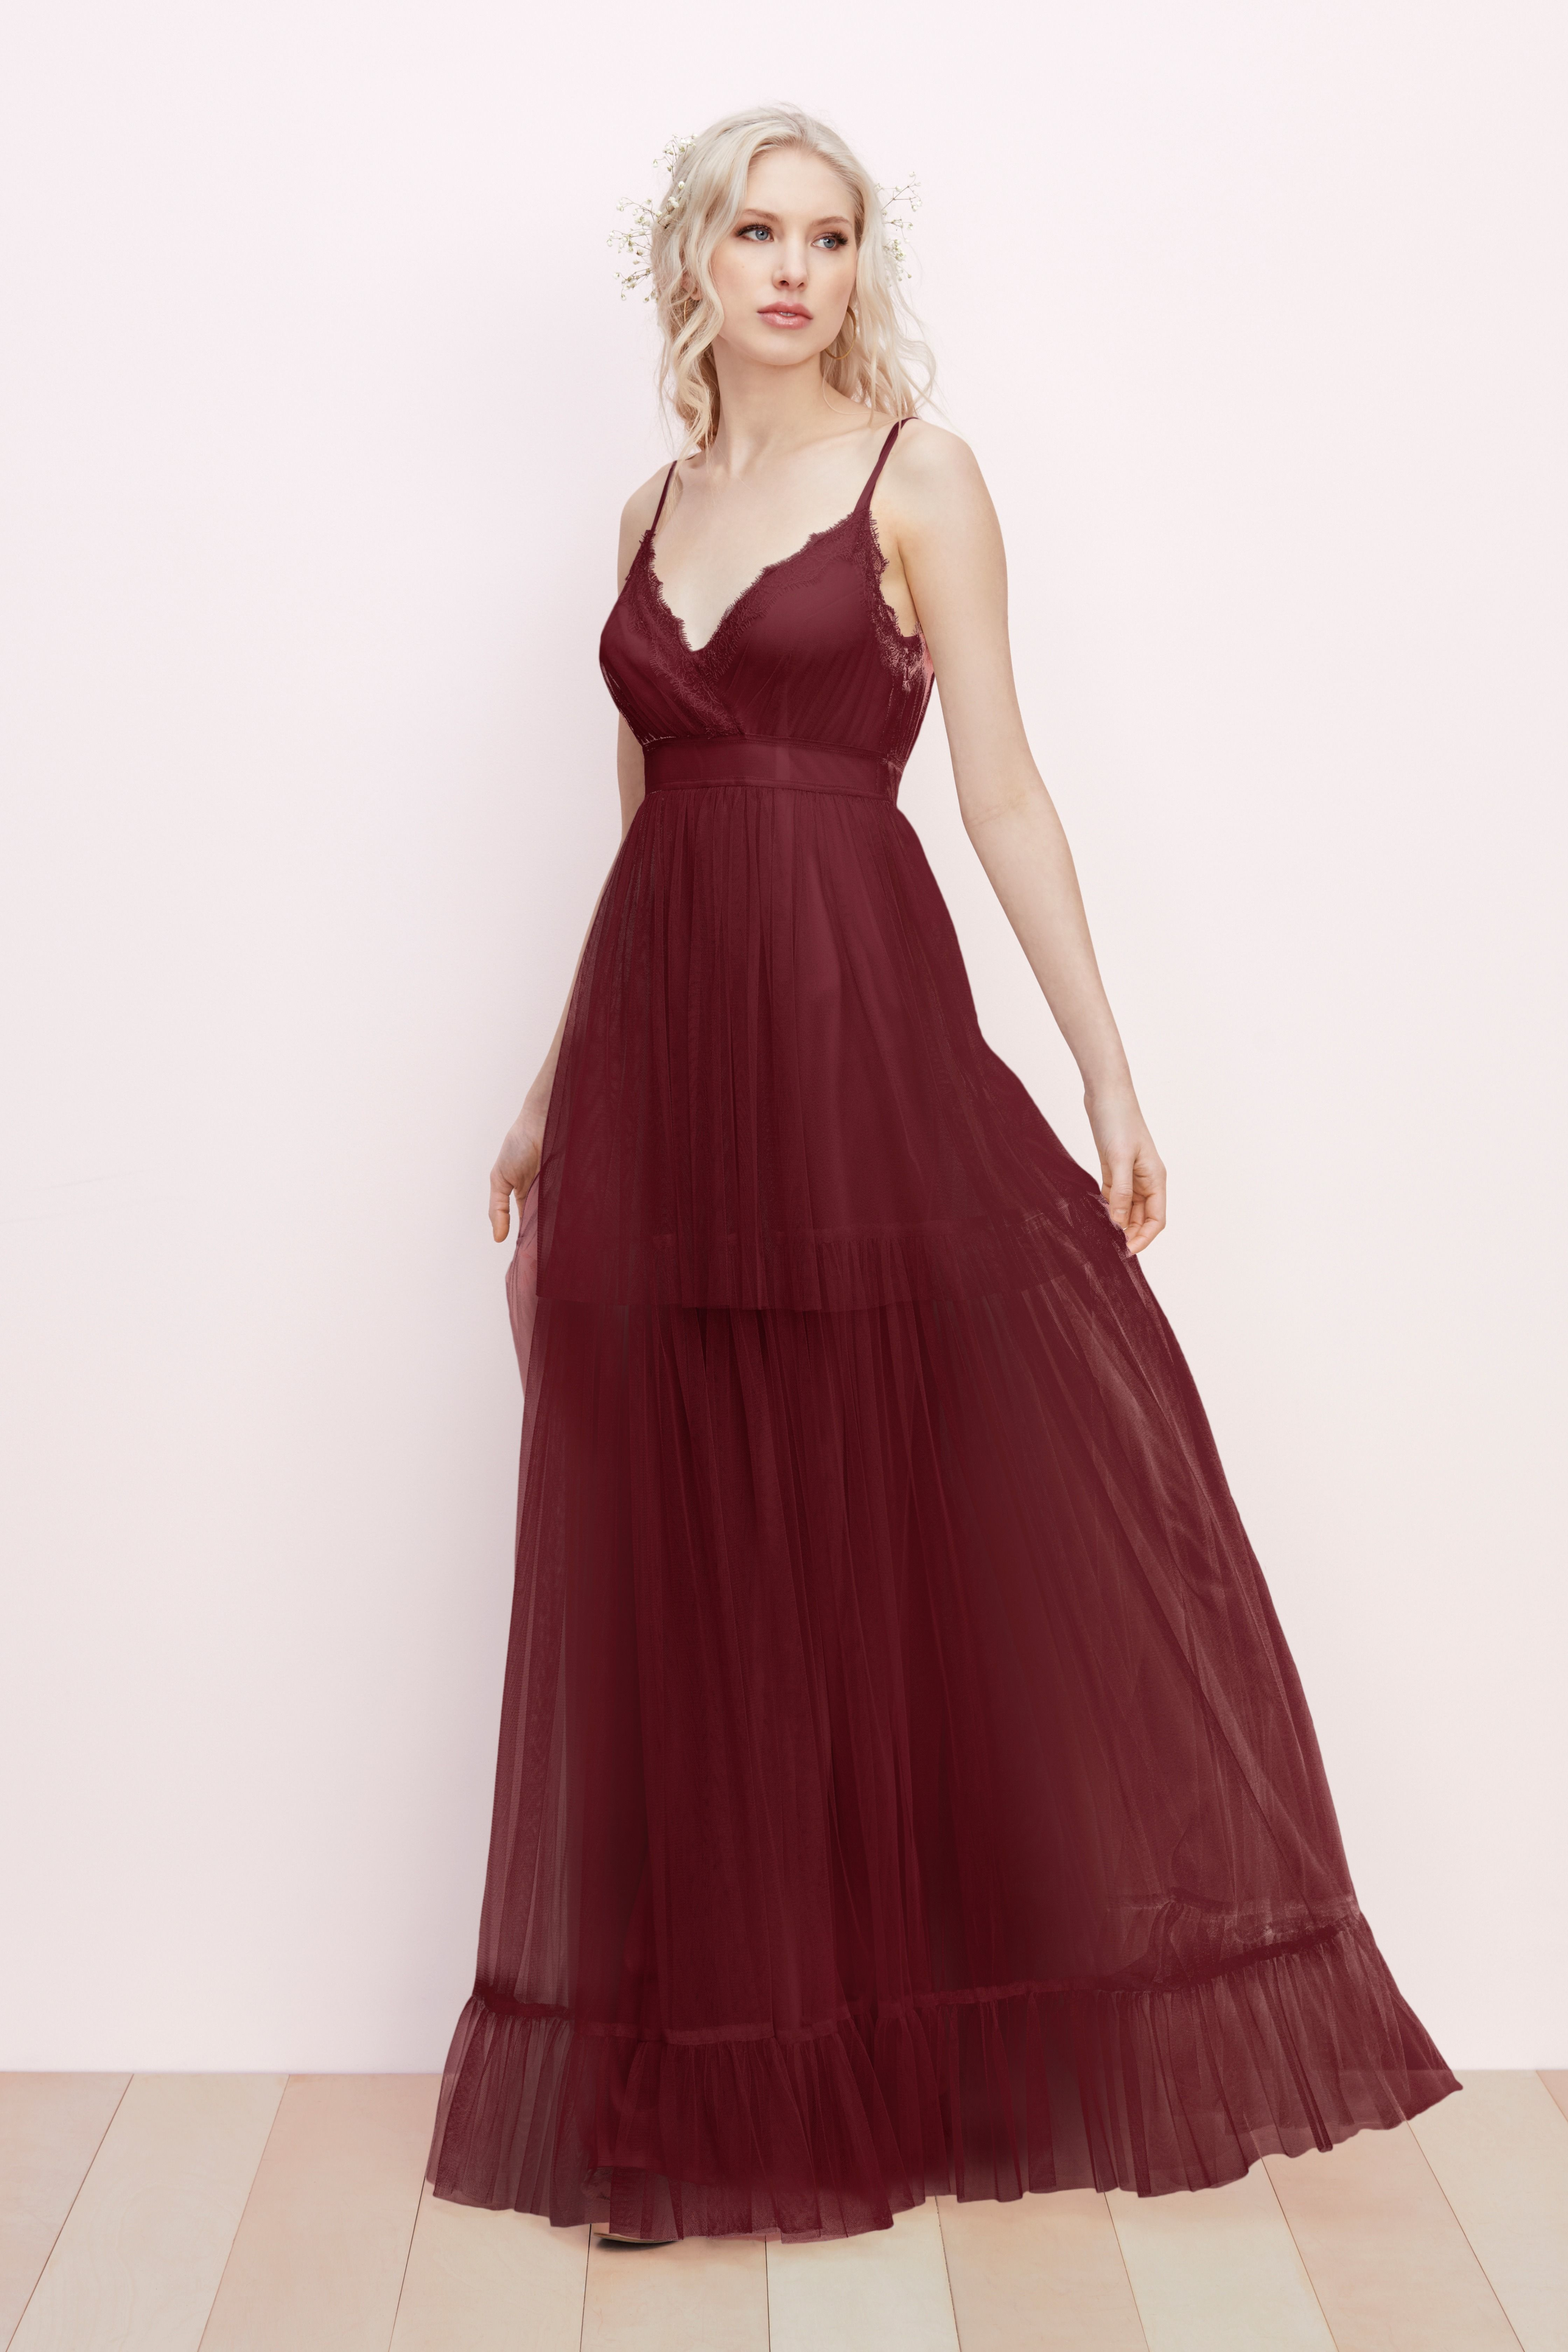 Wine Red Prom Dress Pesquisa Google Prom Dress Boutiques Burgundy Prom Dress Prom Dresses